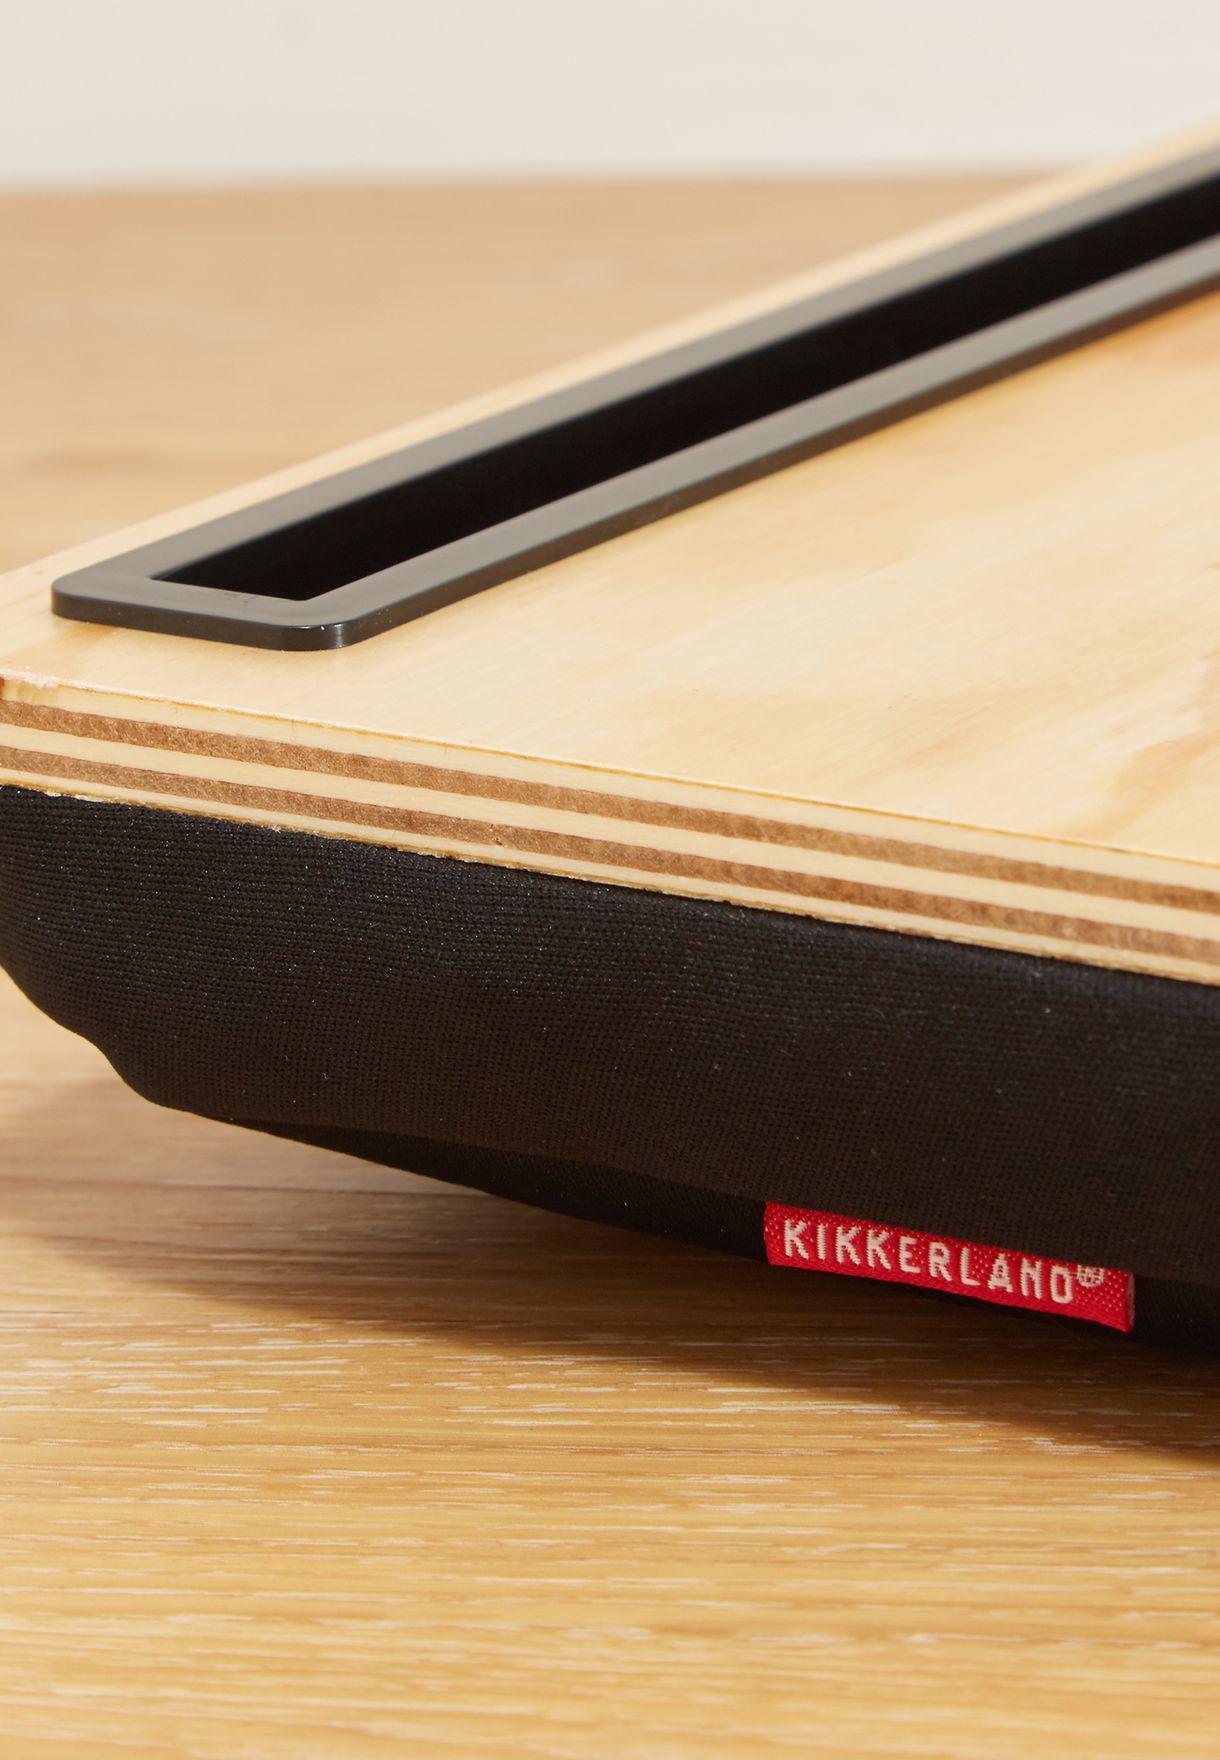 Wooden iBed Lap Desk